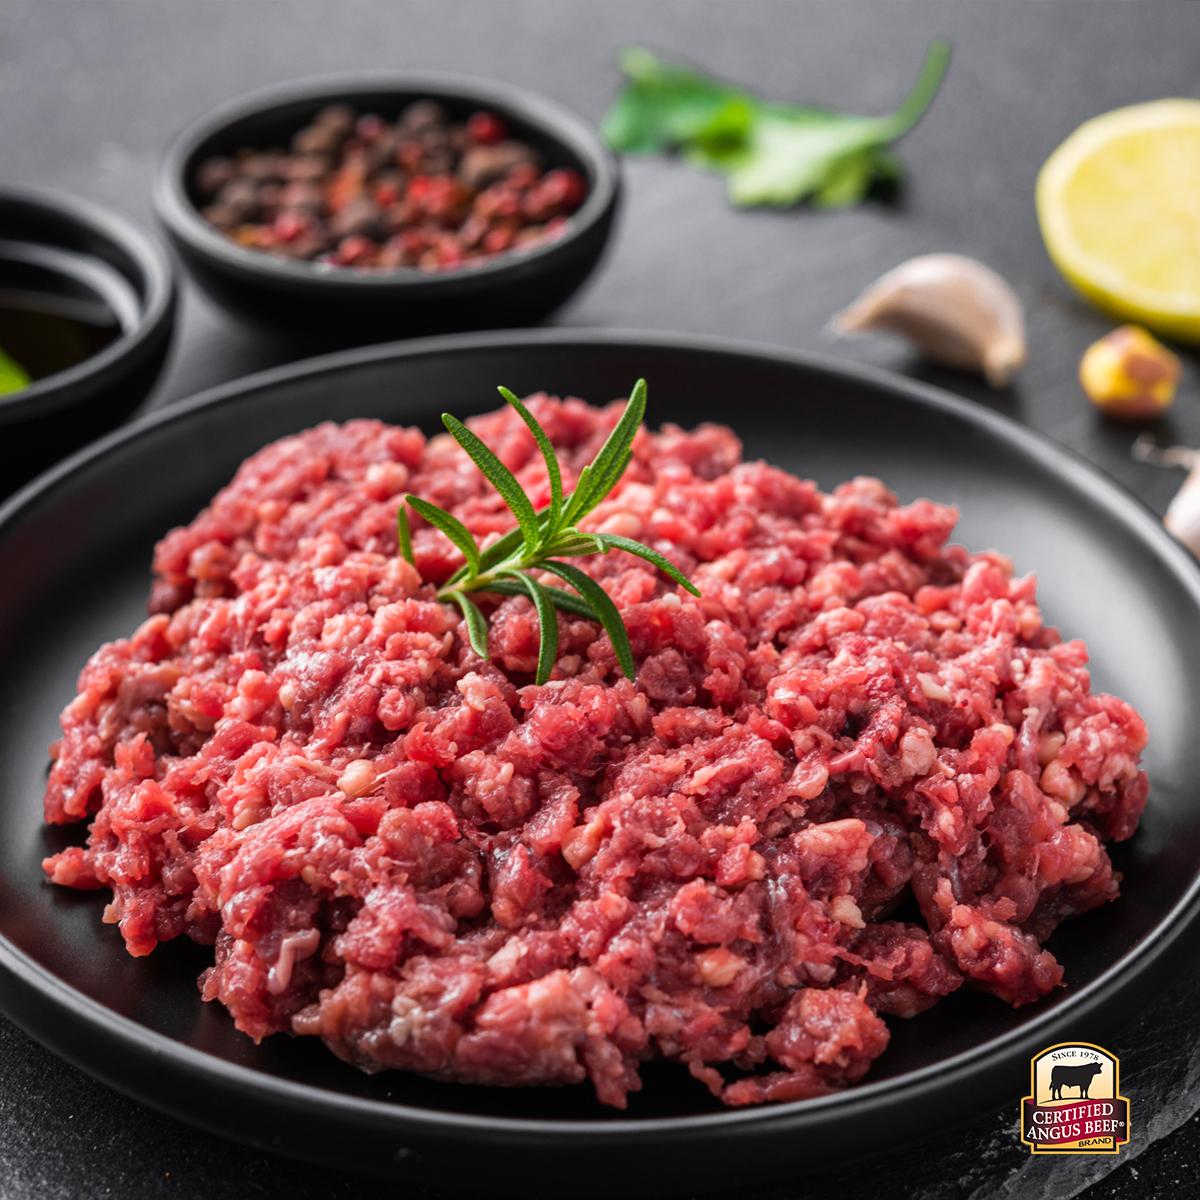 Carne Molida 80/20 Certified Angus Beef®, 3 LB